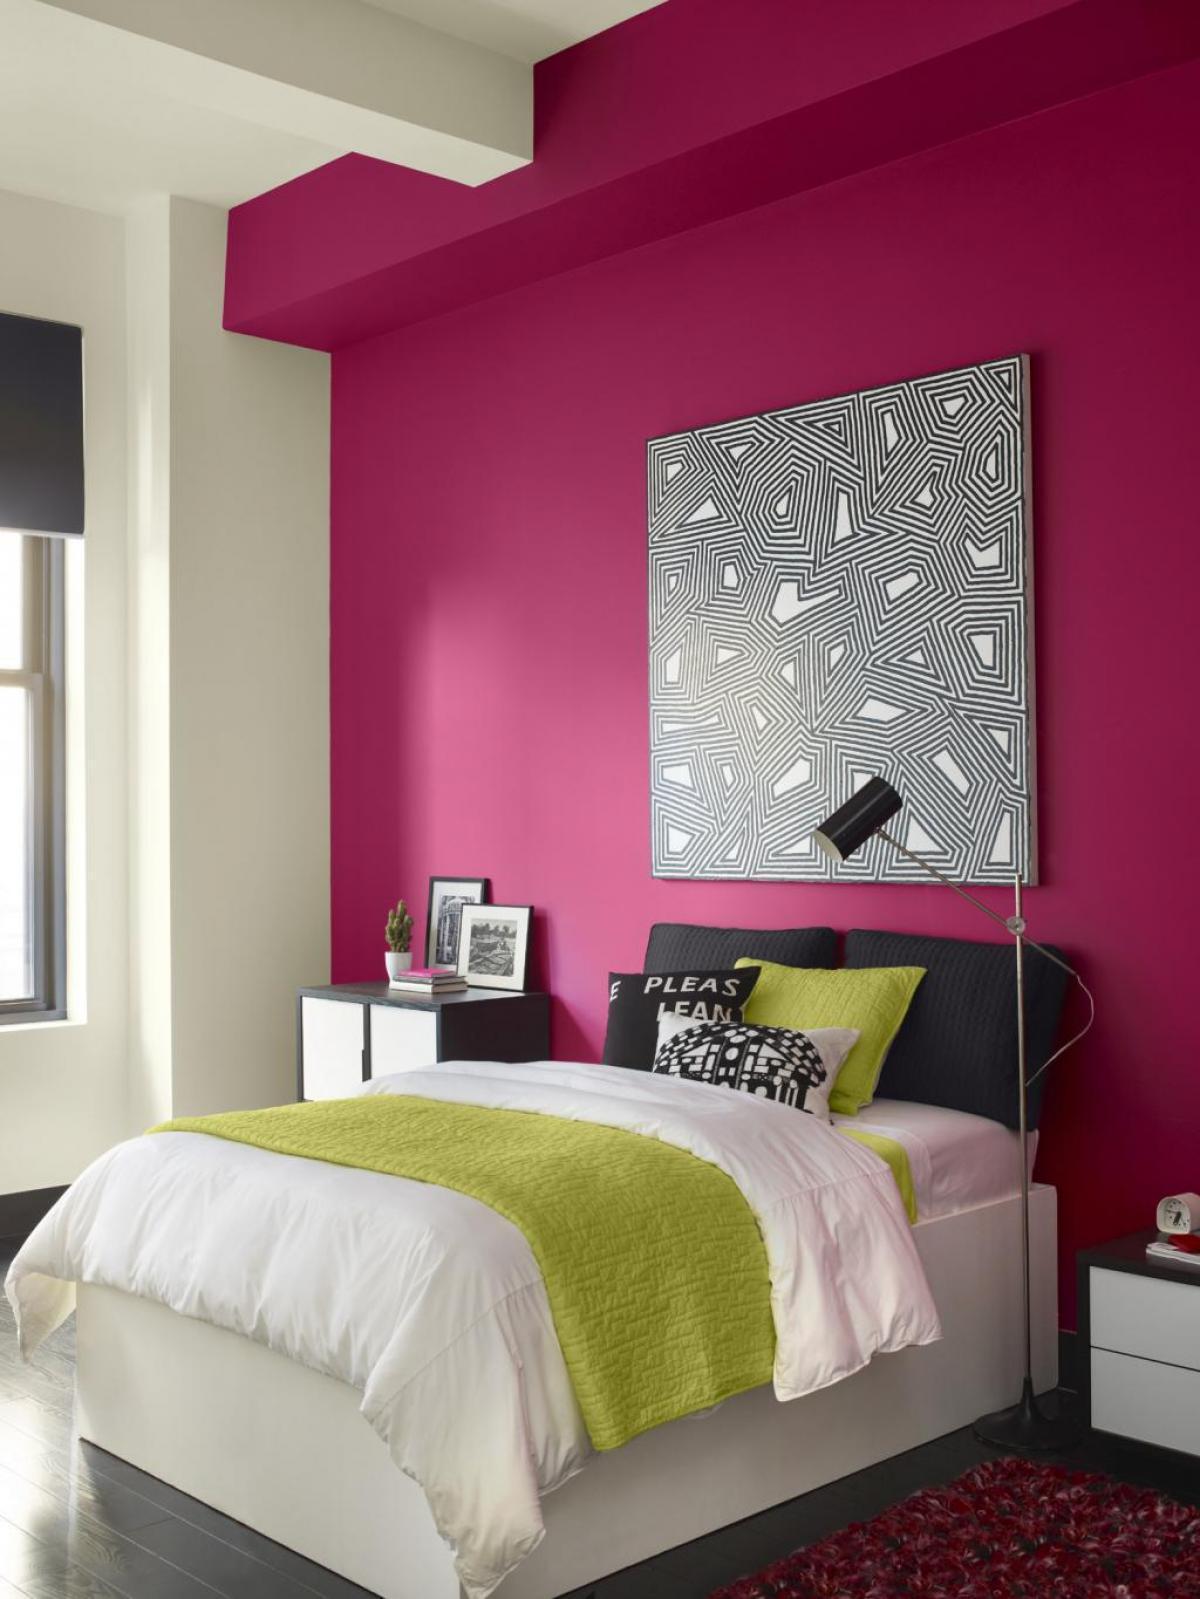 bedroom color combination images Teens bedroom remarkable pink and green teen bedroom inspiration  1599 X 1200